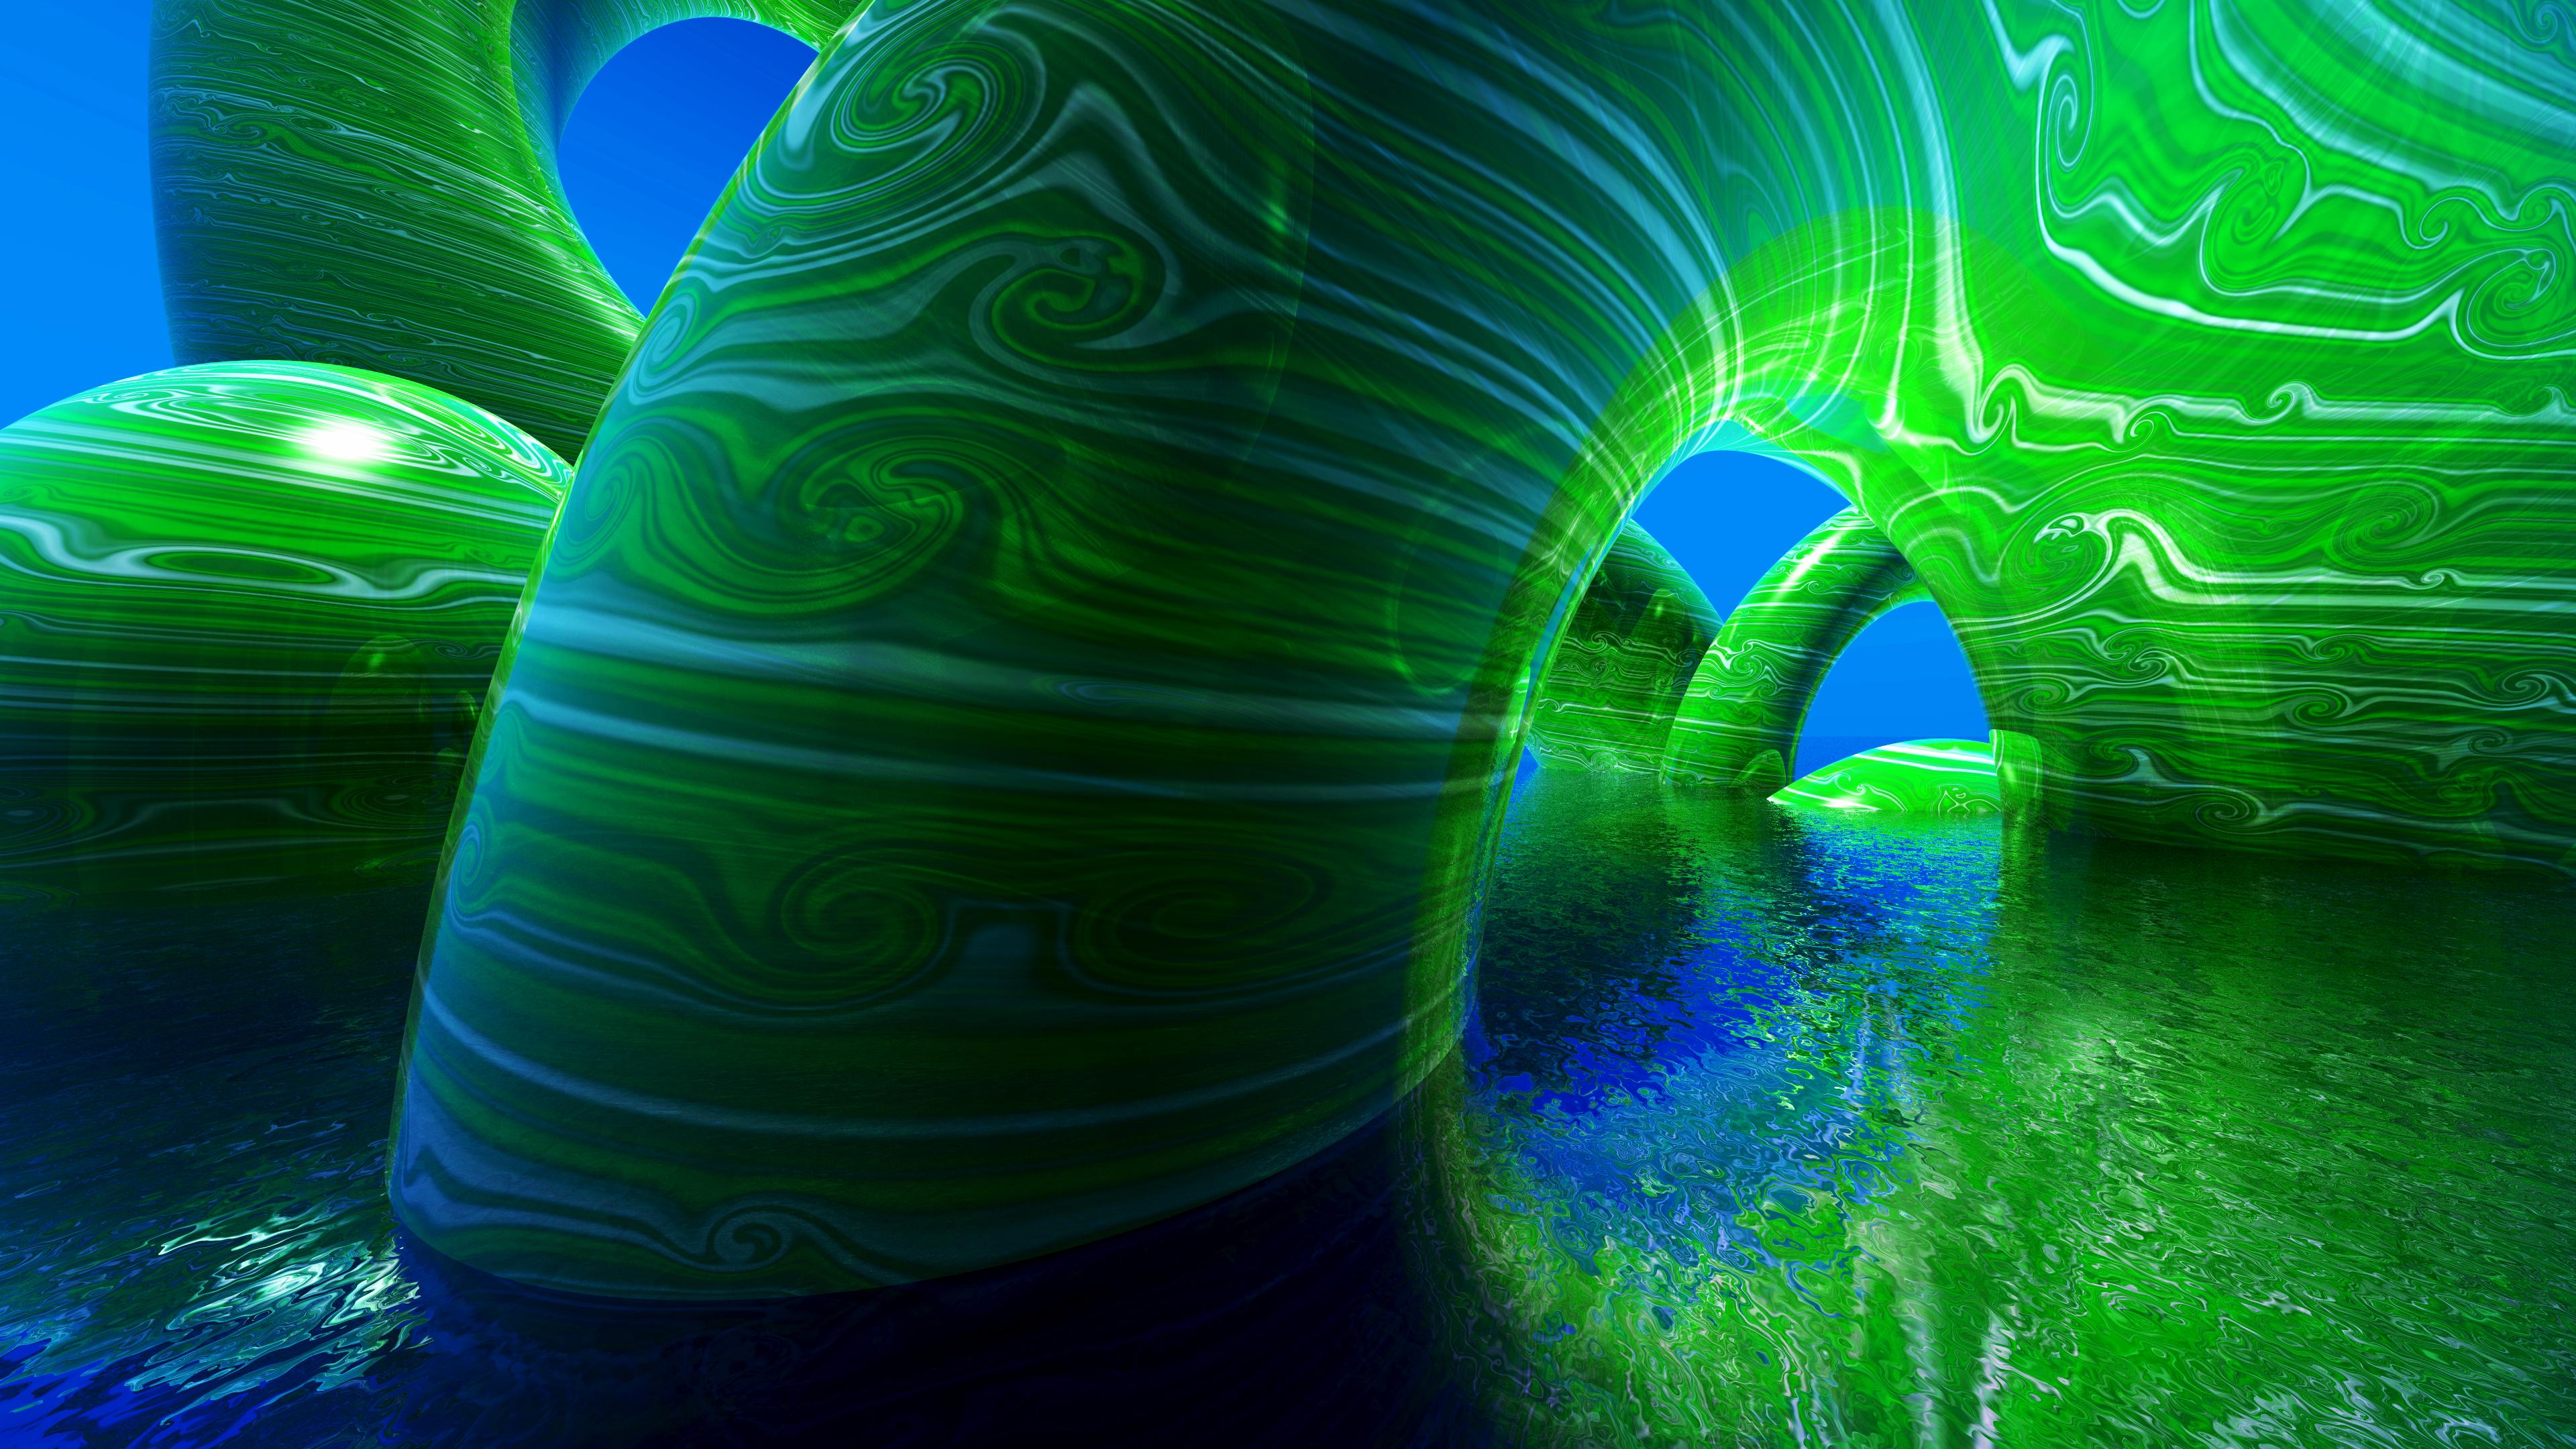 Blue Abstract 4K Wallpaper Full 1080p Ultra HD Wallpapers 3840x2160